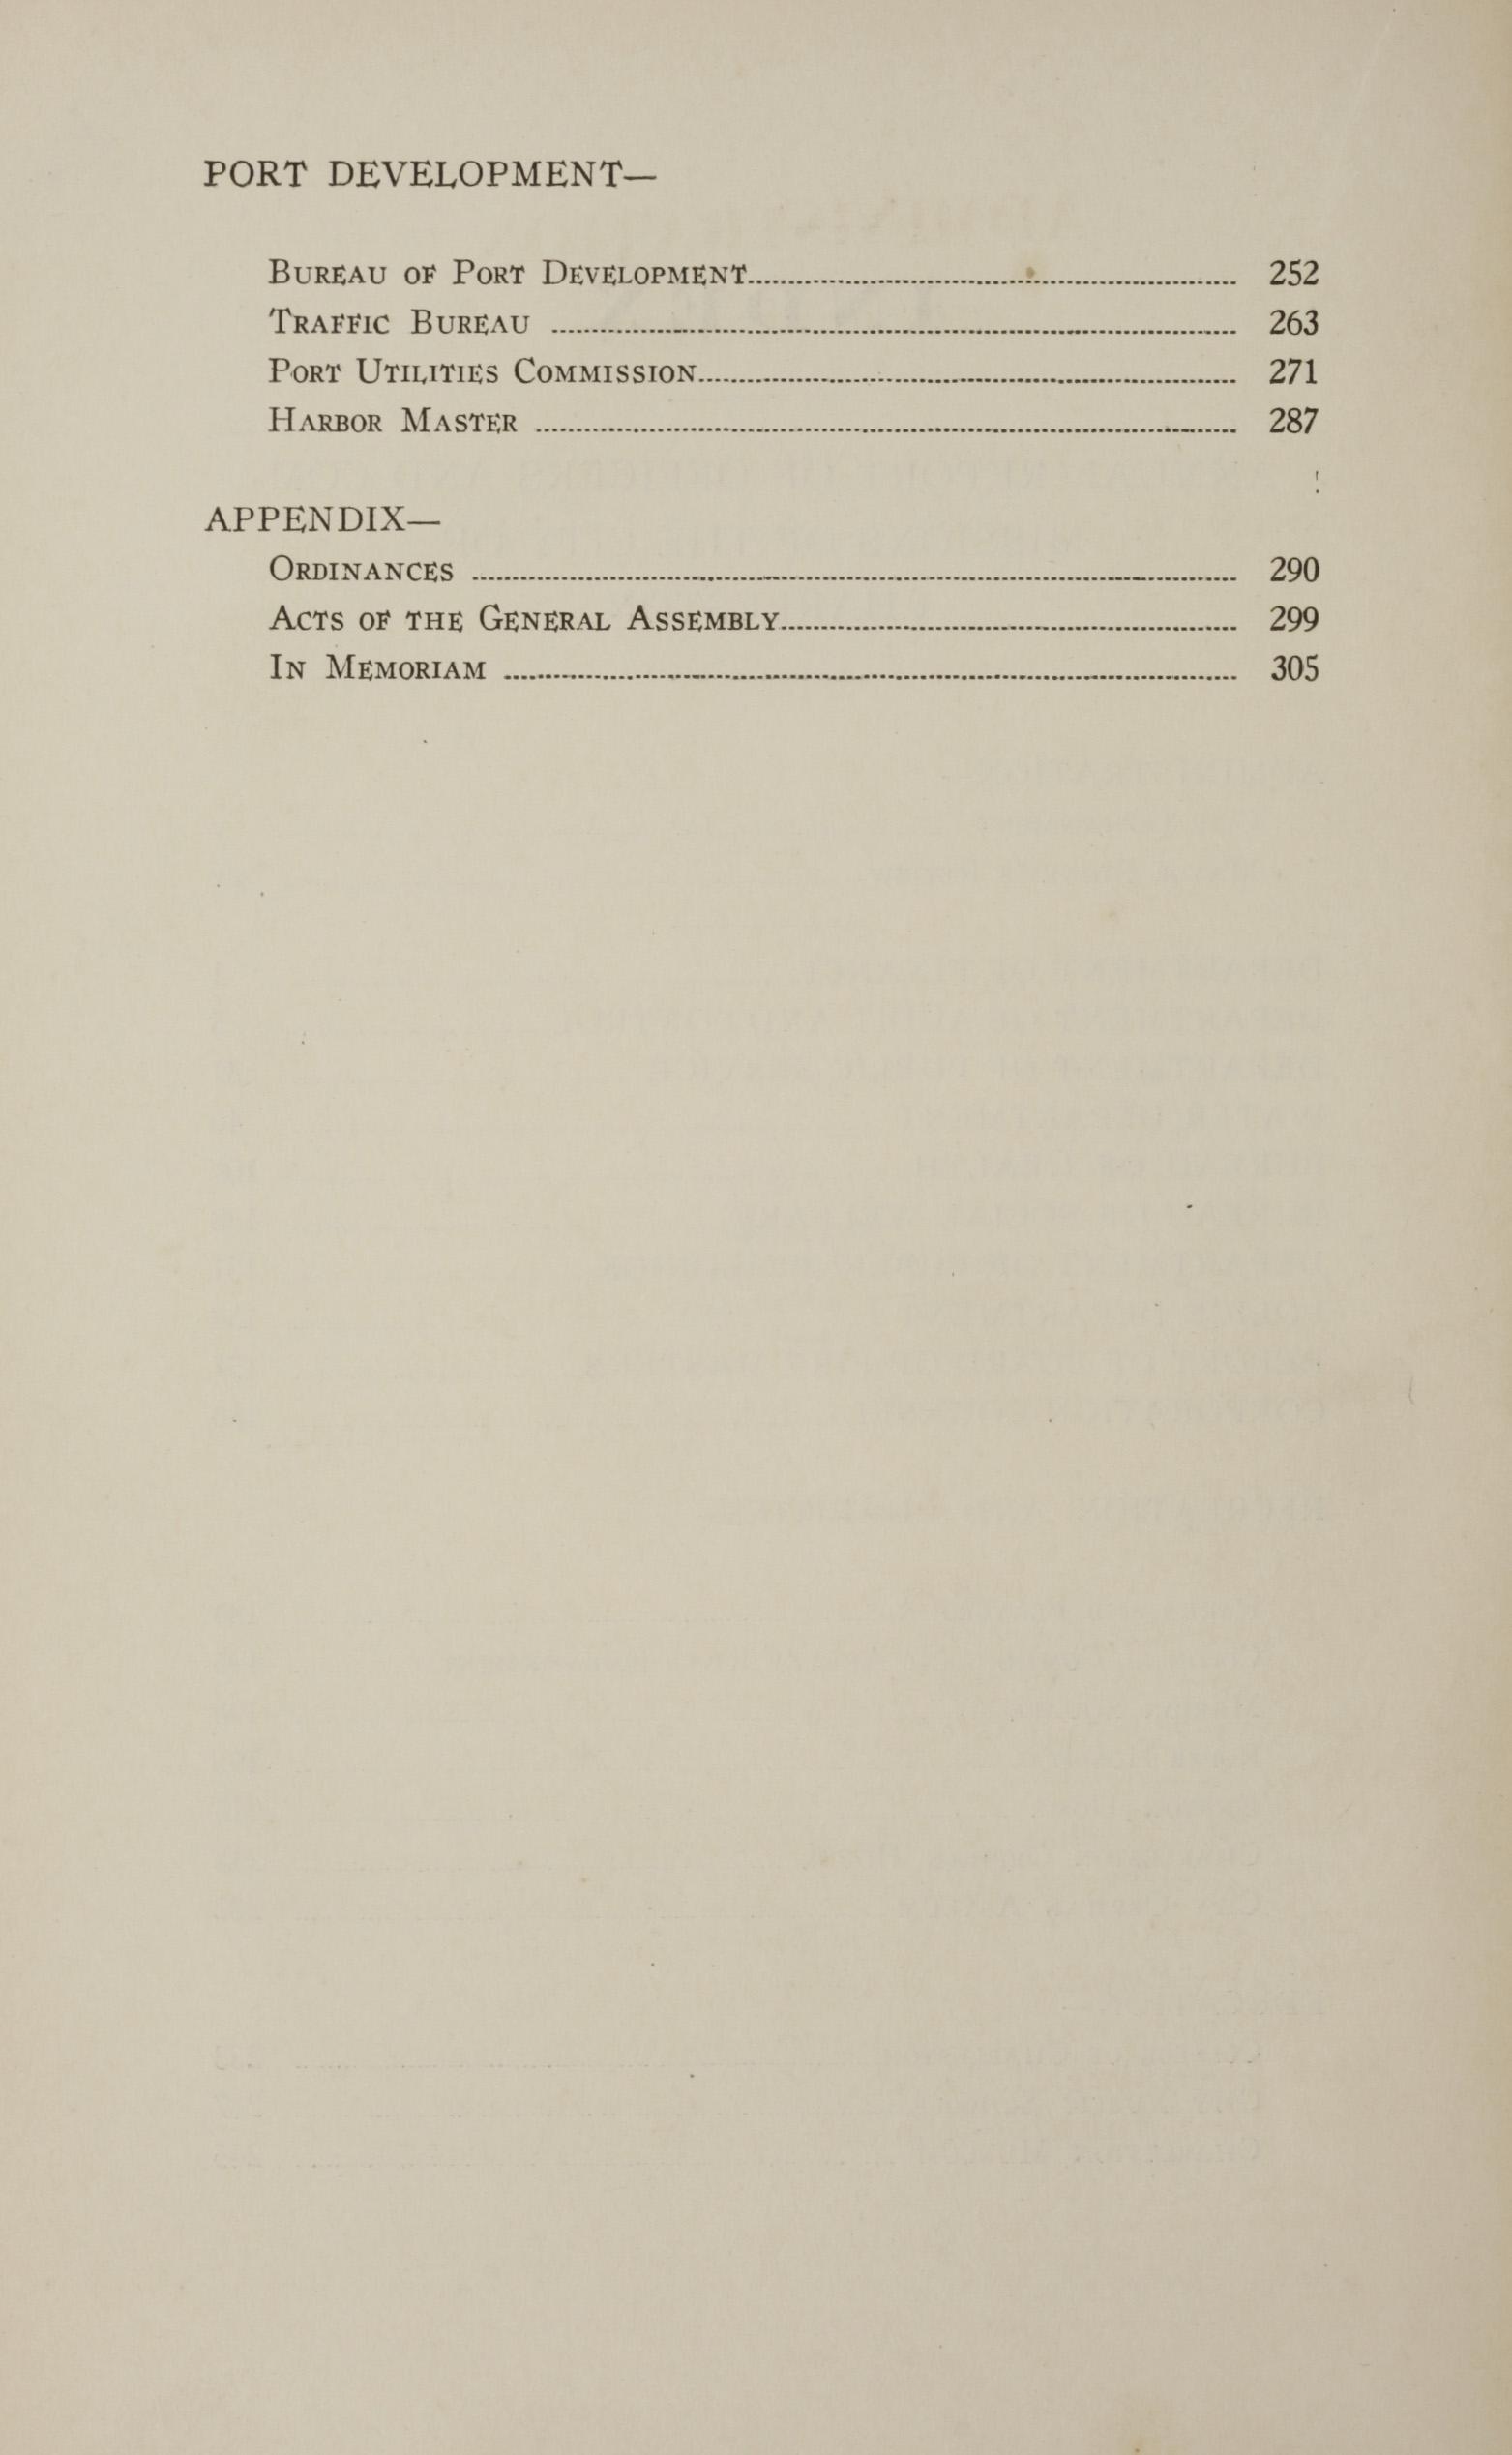 Charleston Yearbook, 1928, page iv